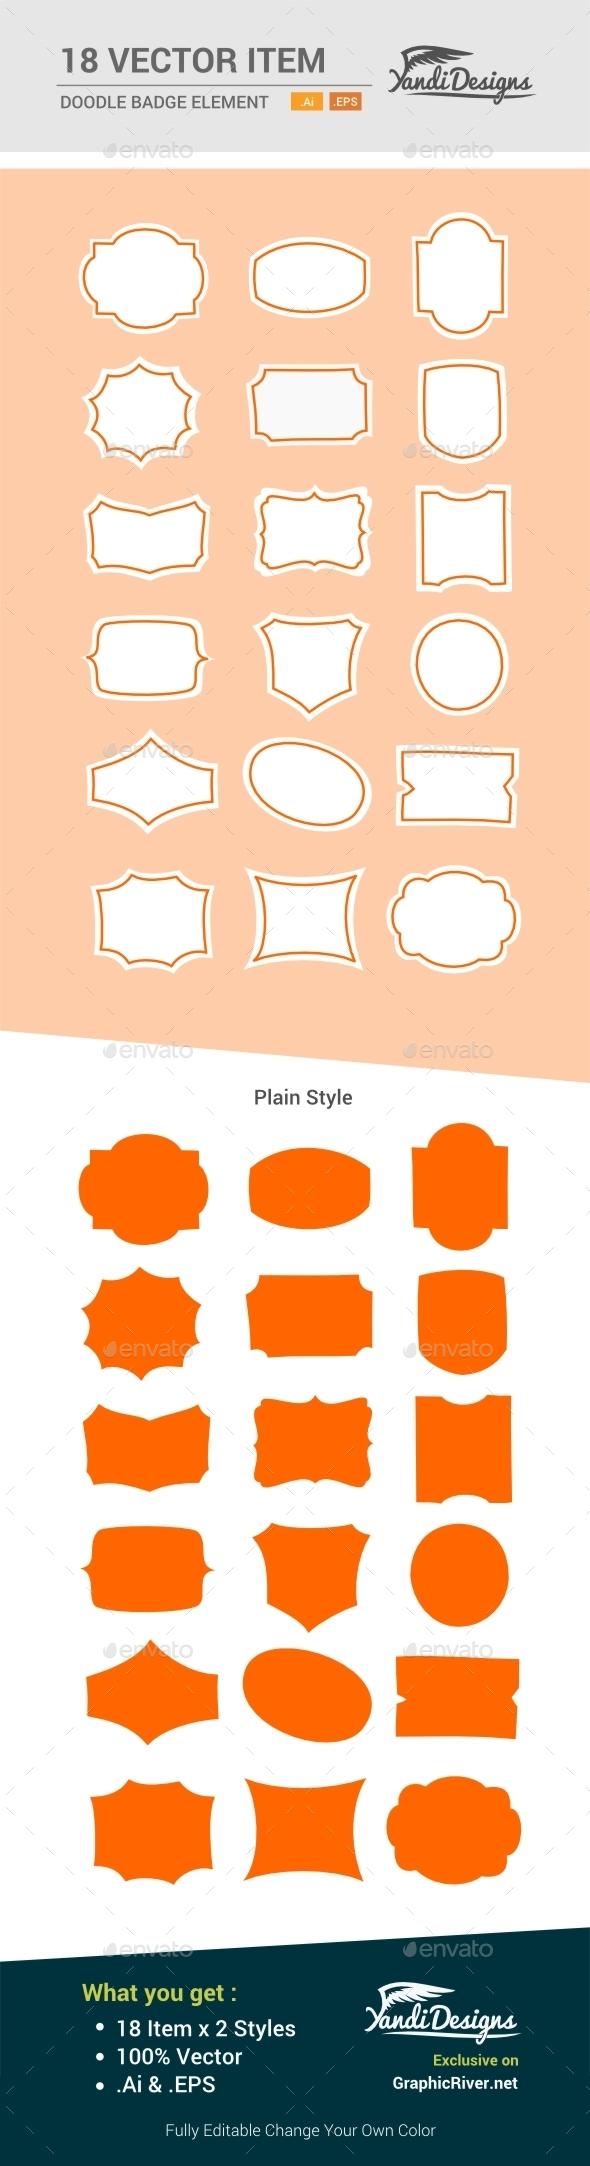 GraphicRiver Doodle Badge Element 10515775